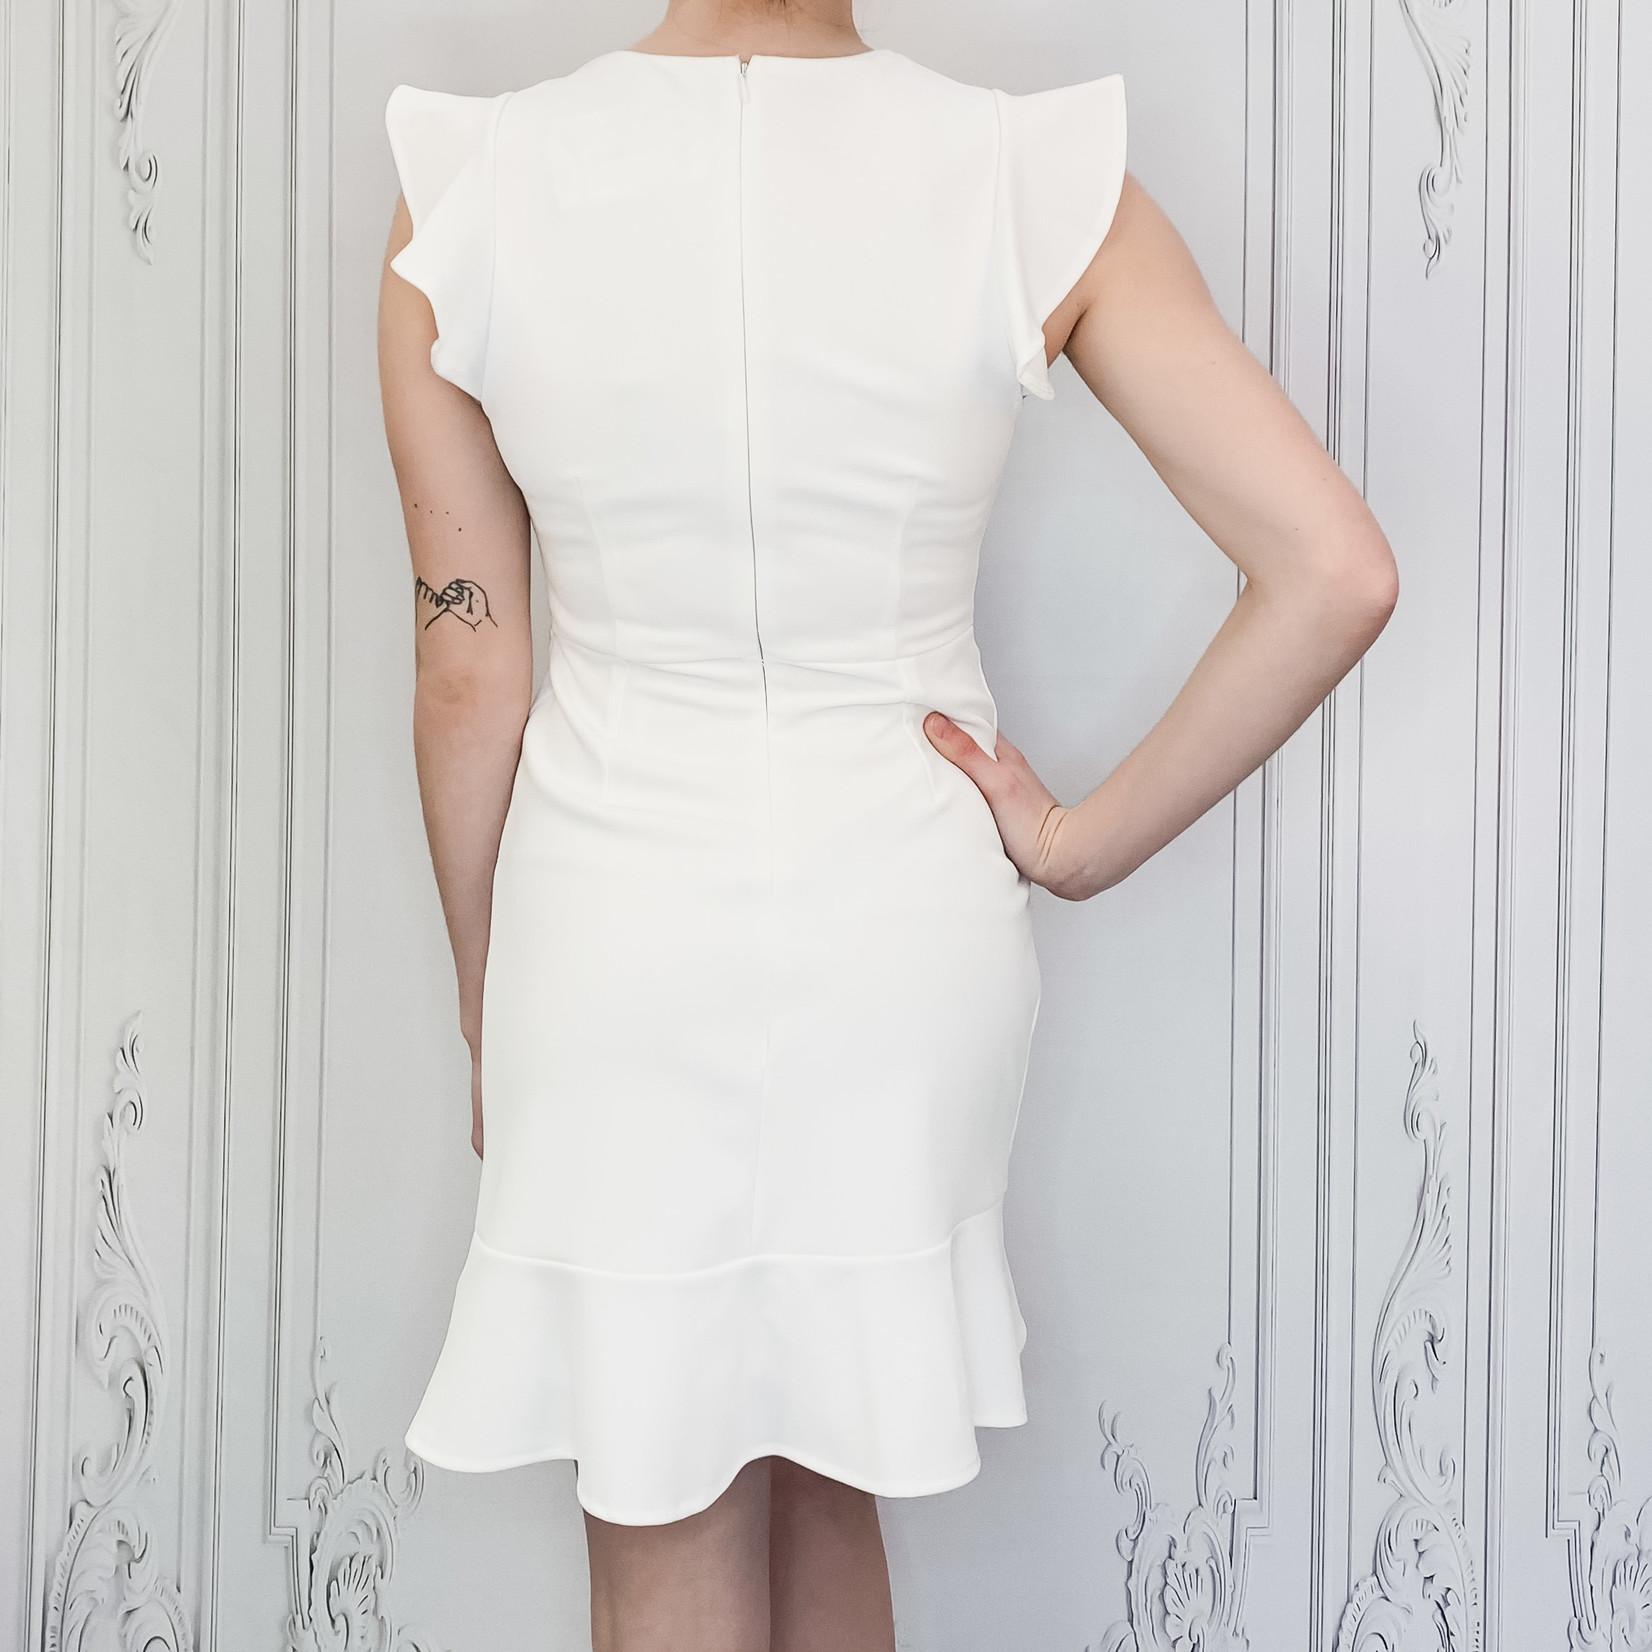 Sammy ruffled cap sleeve dress